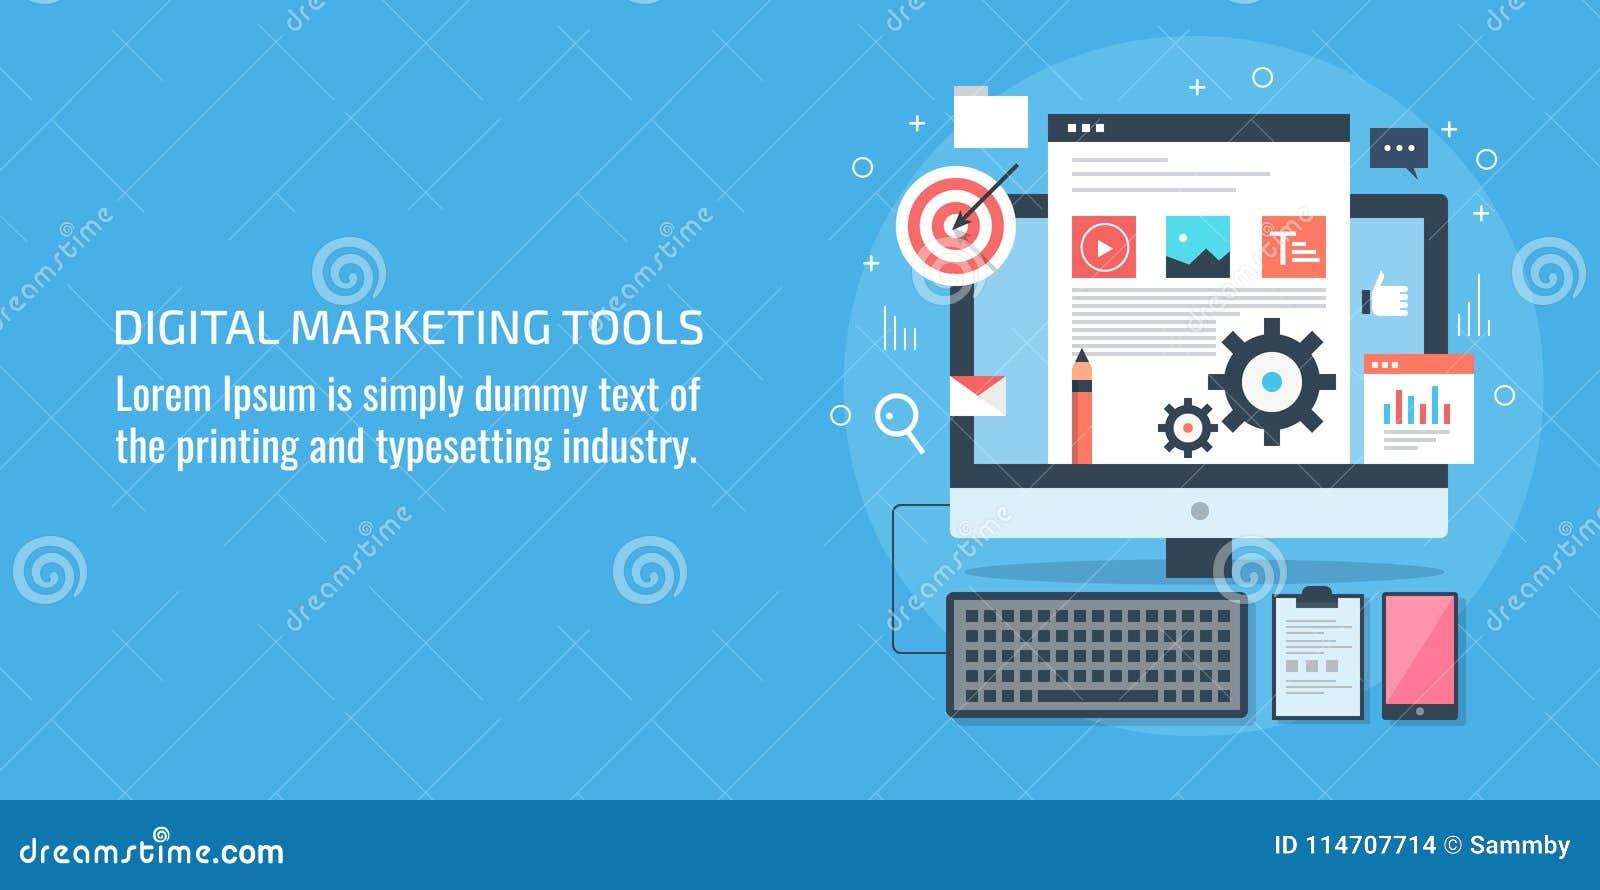 Digital-Marketinginstrumente, Arbeitsplatz, digitales Gerät, Inhalt, Software-Konzept, flache Designvektorfahne